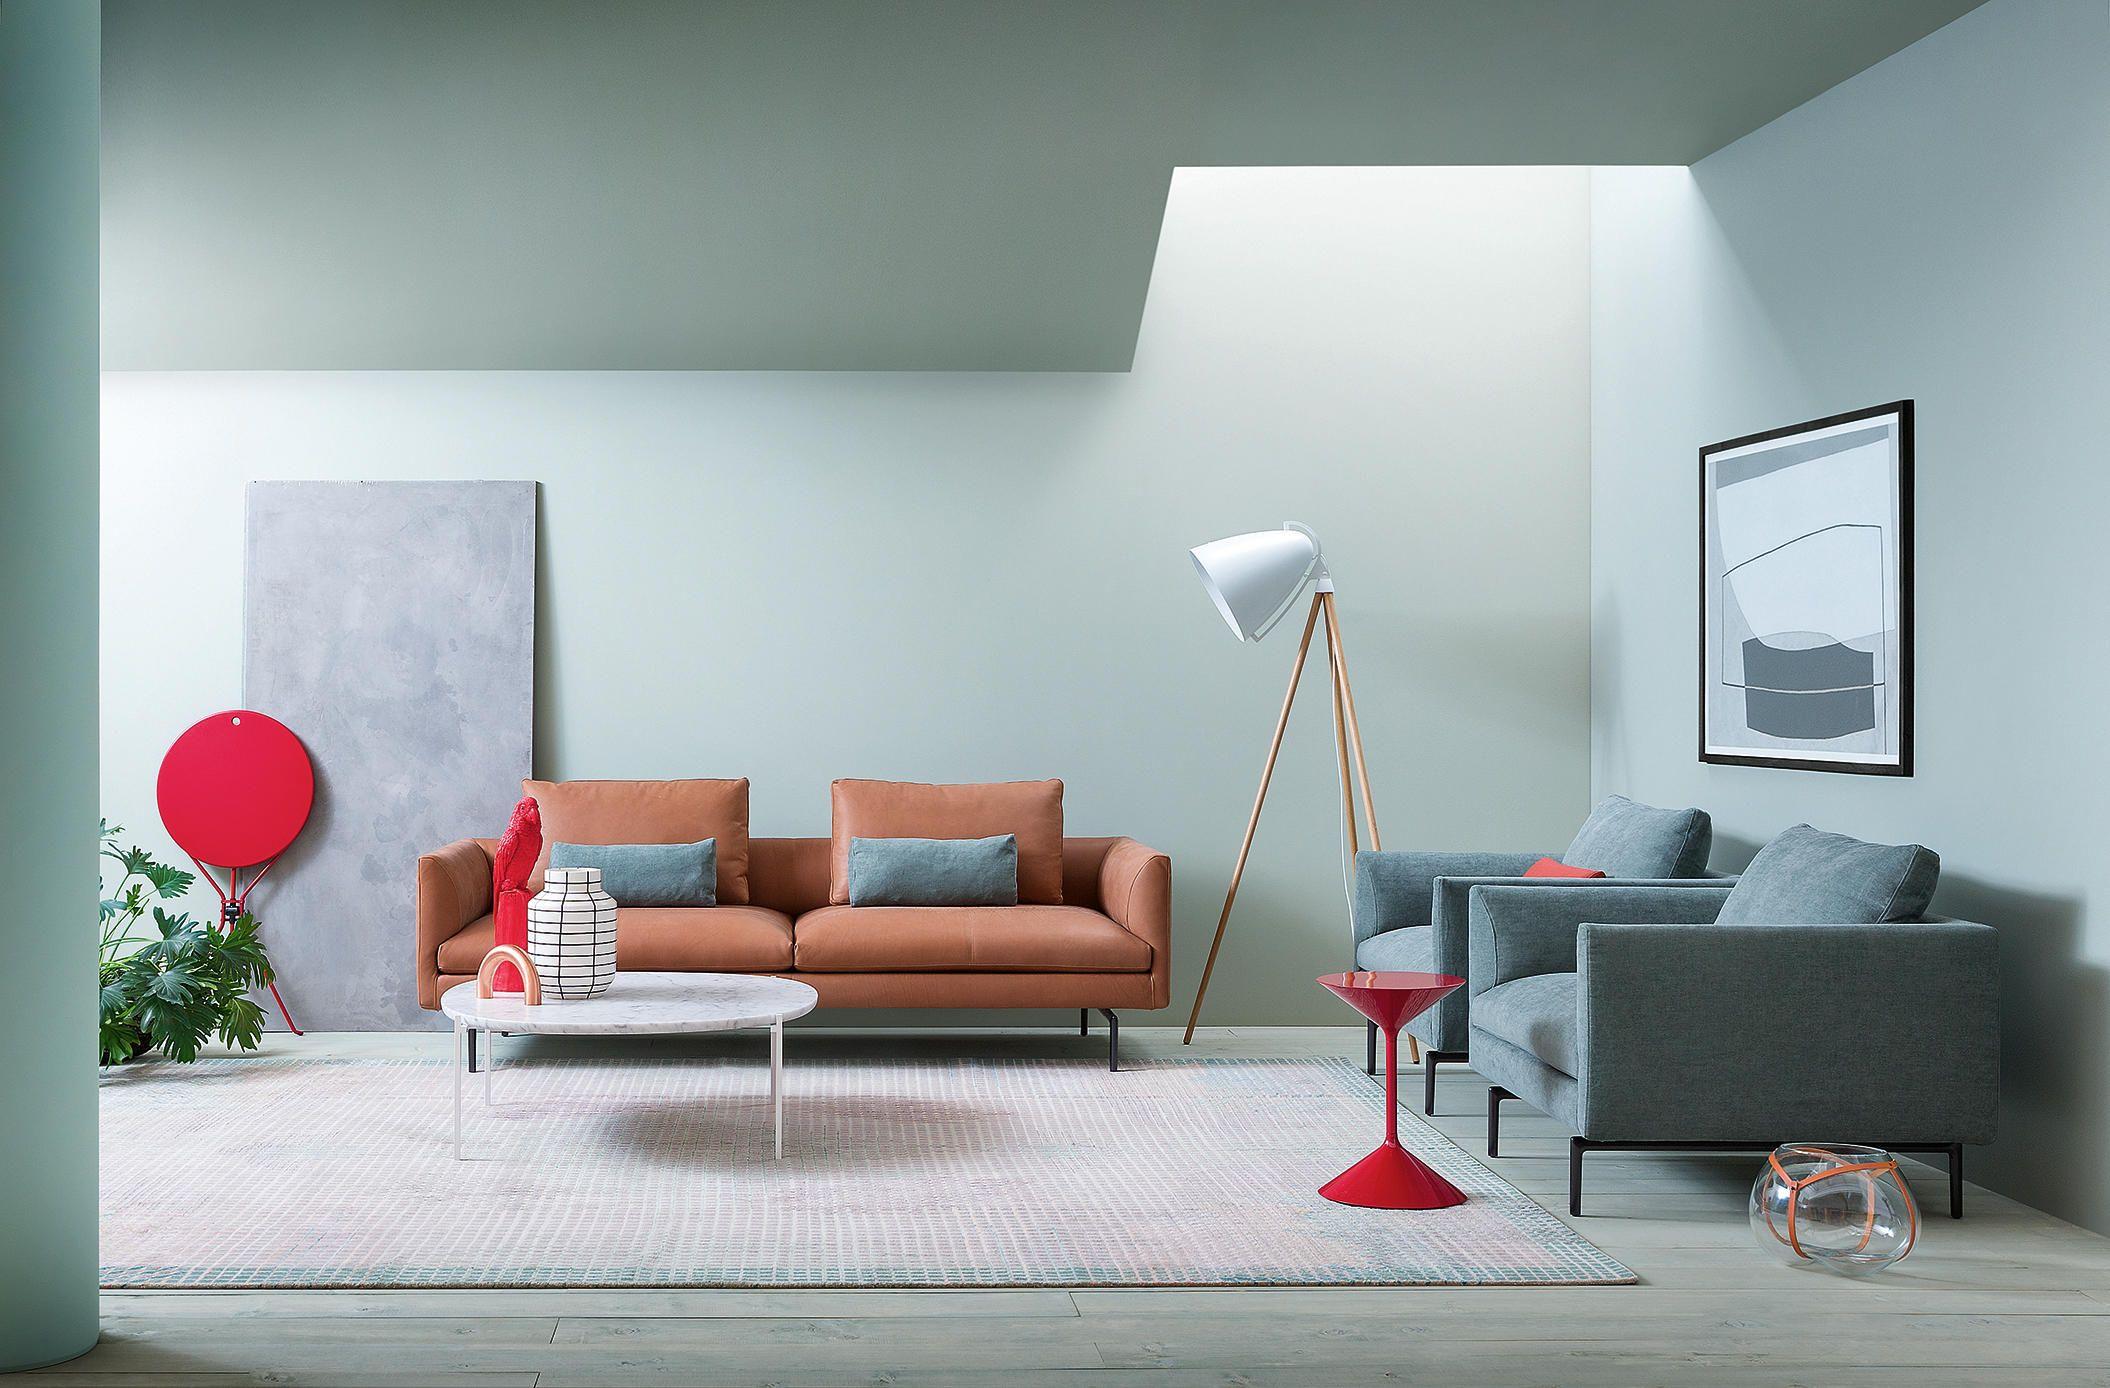 FLAMINGO | 1333   Designer Sofas From Zanotta ✓ All Information ✓  High Resolution Images